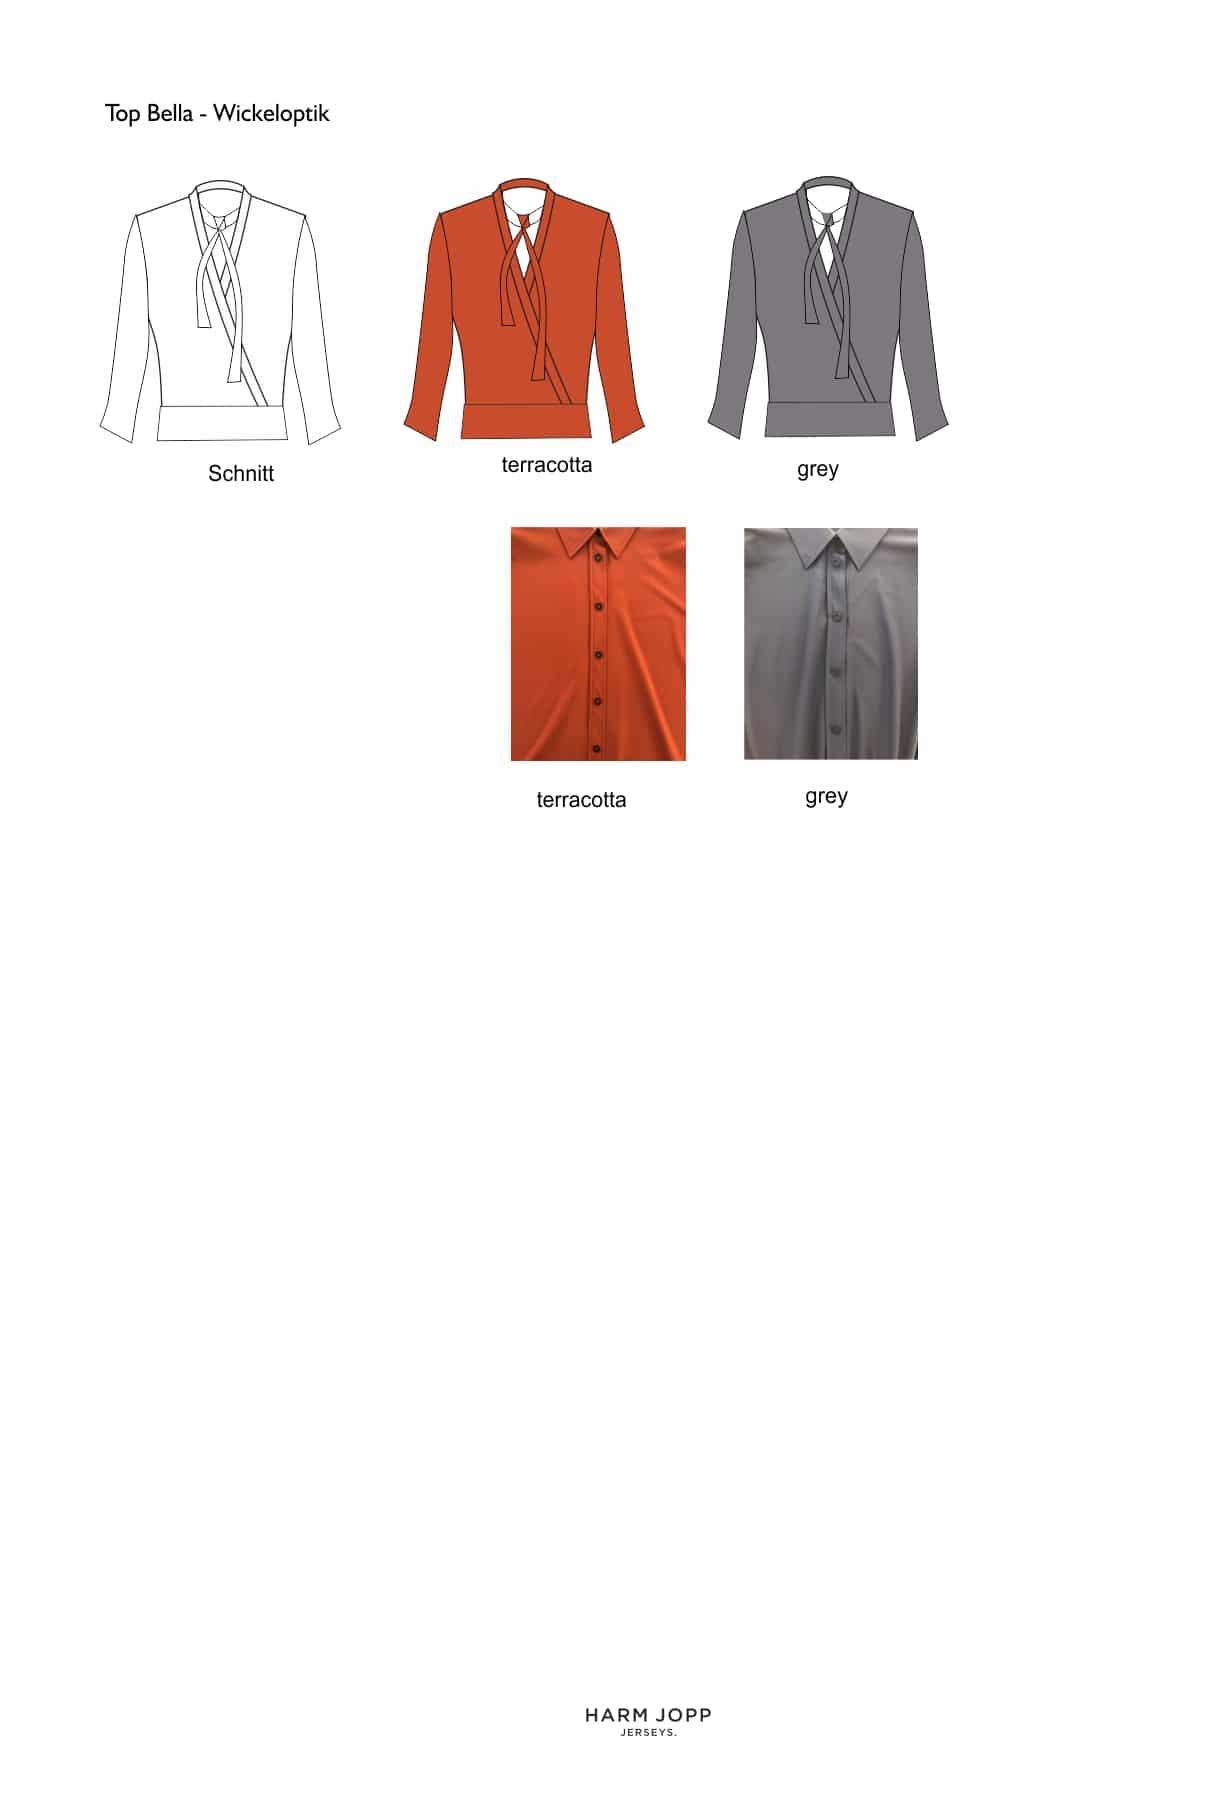 zeichung top bella 2 online shop 1